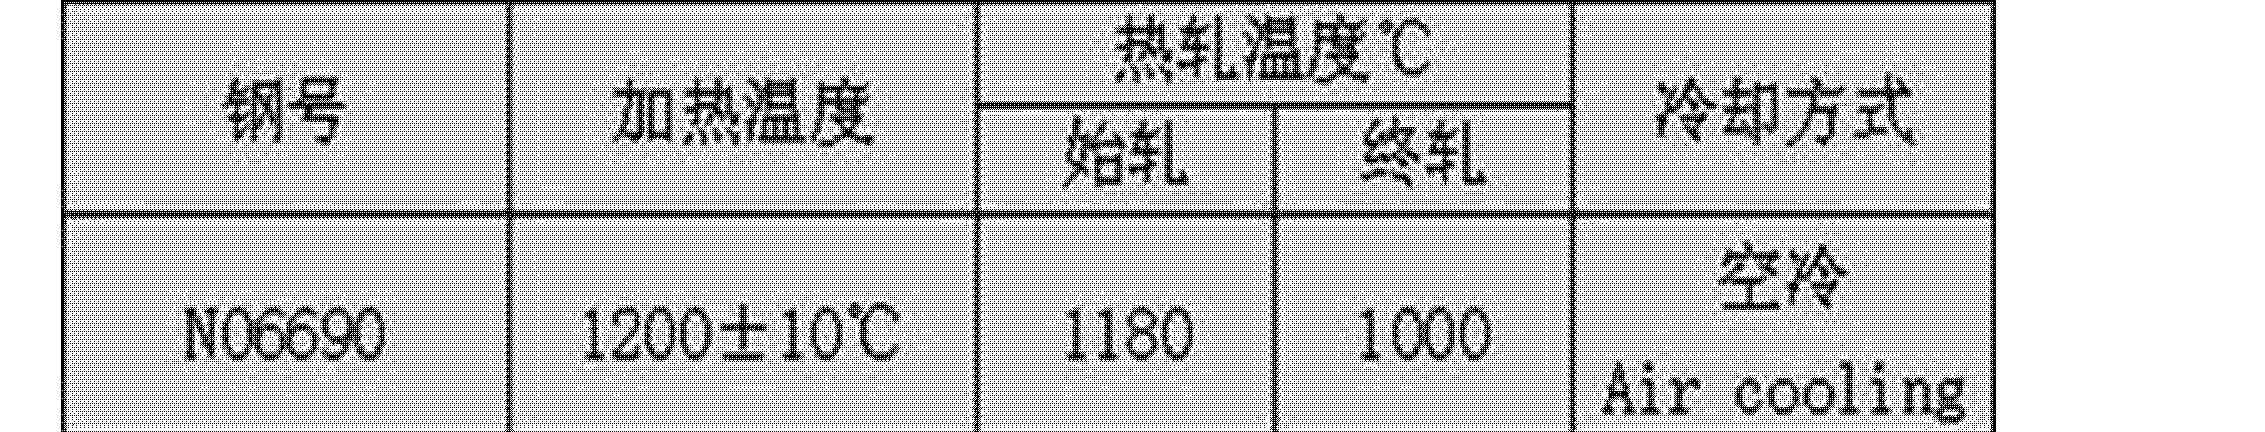 Figure CN103921079AD00133